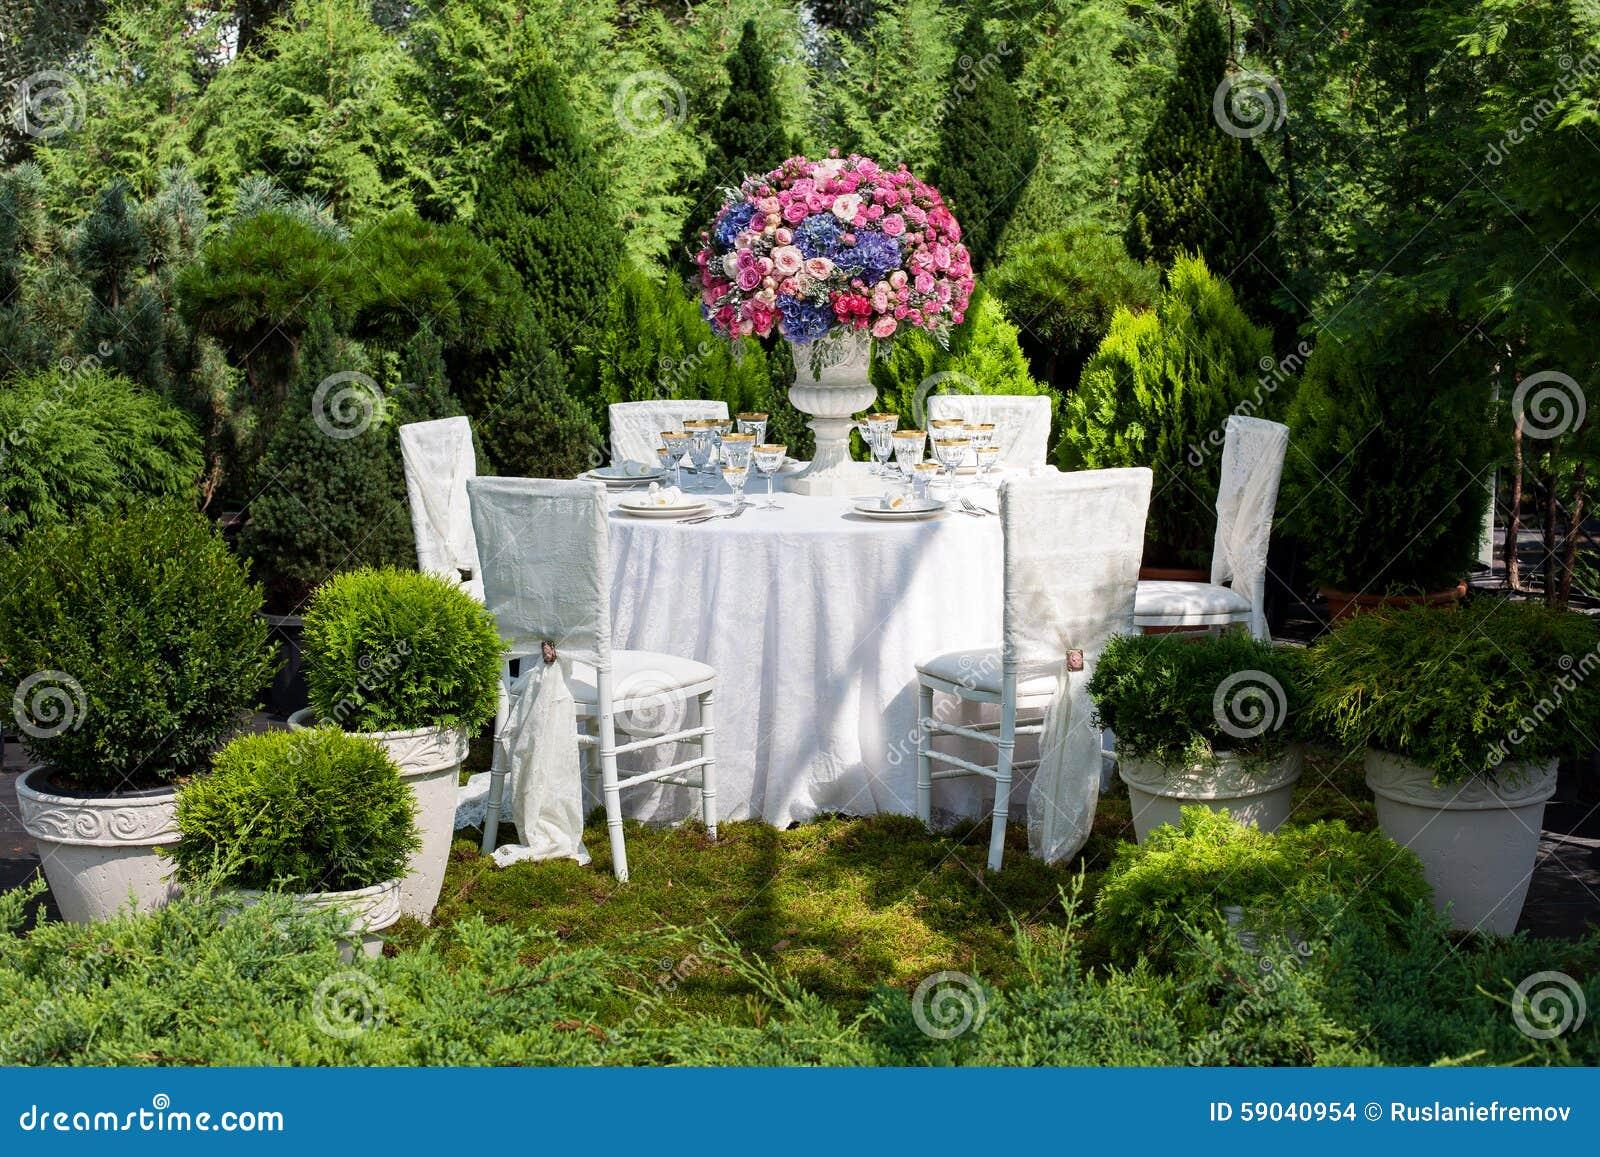 Luxury Backyard Wedding : Table Setting At A Luxury Wedding Reception Stock Photo  Image